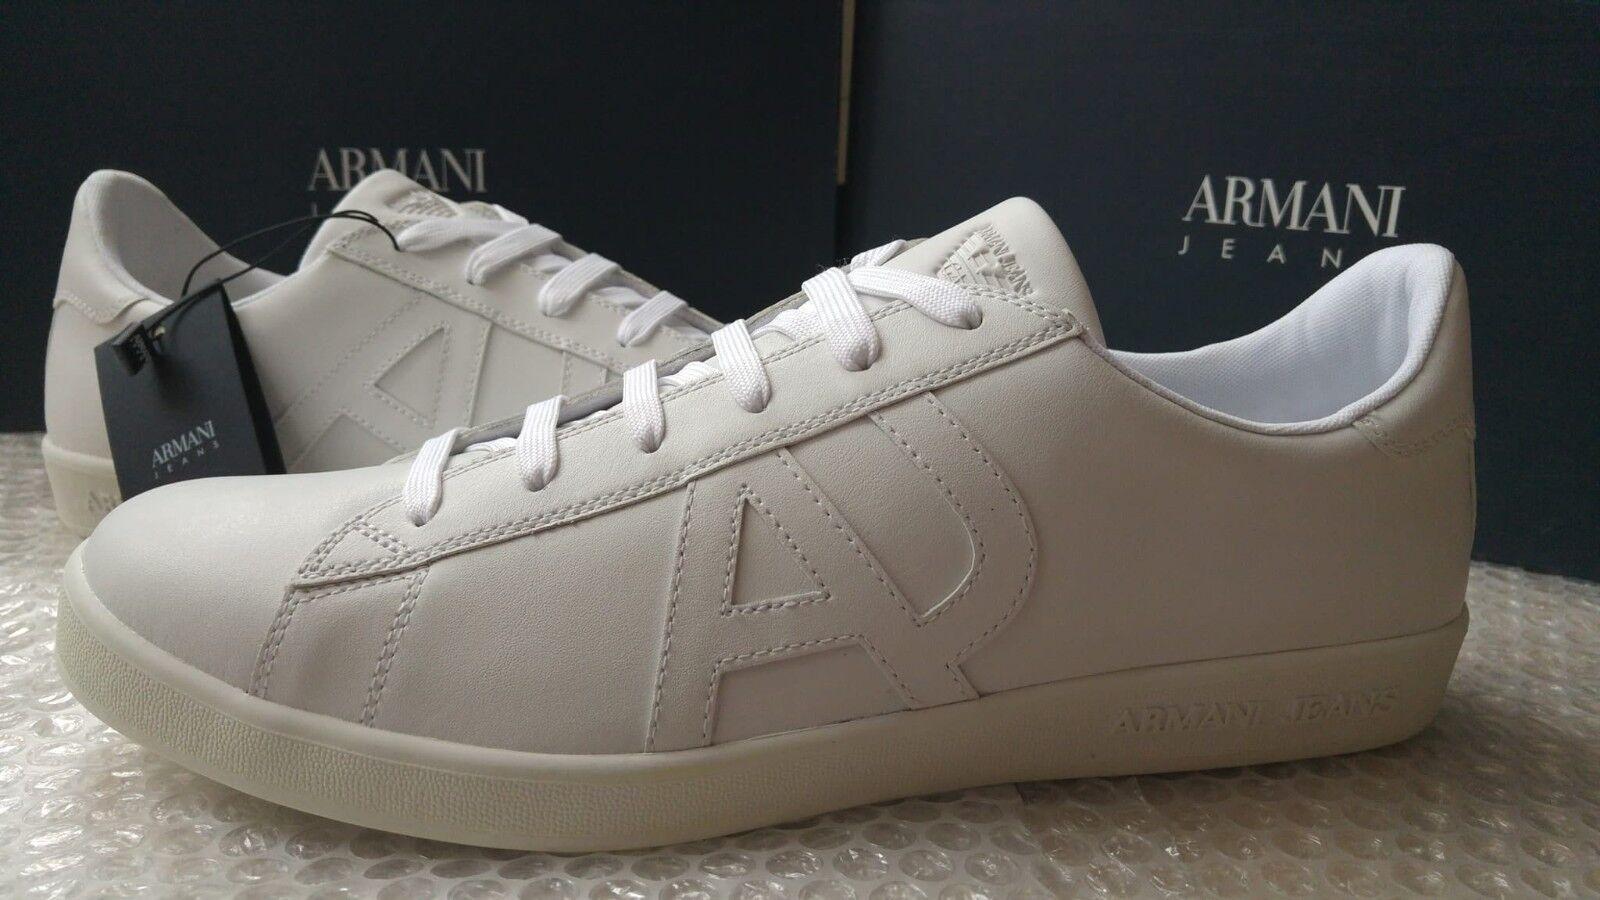 Armani Jeans Low-Cut Zapatillas Tamaño 11.5UK